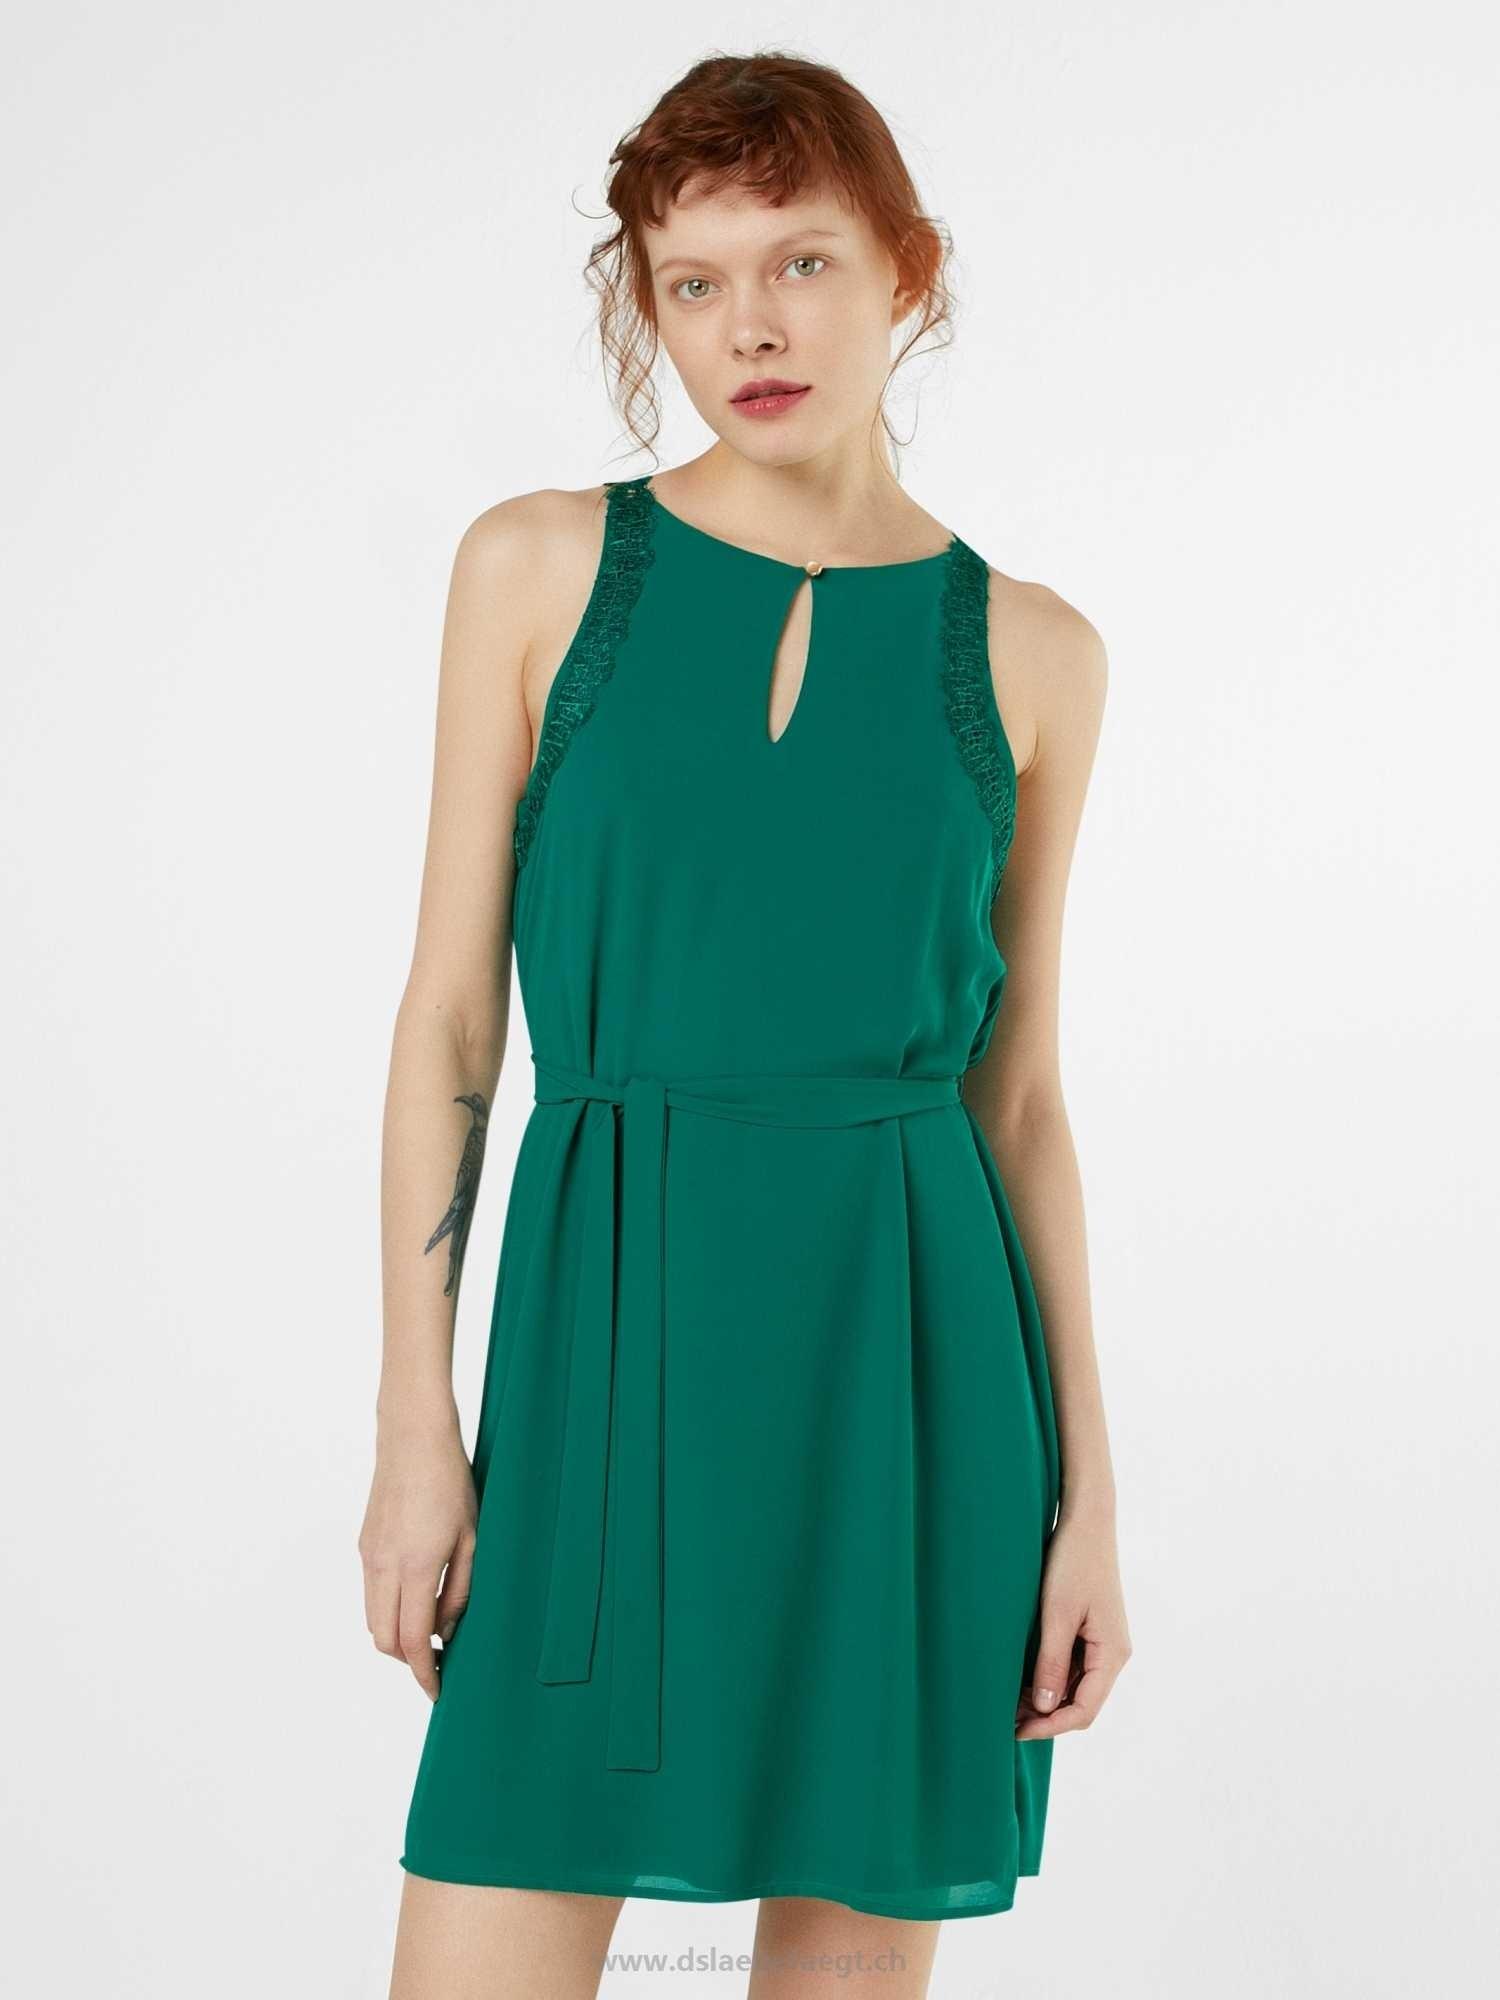 Formal Elegant Damenkleider Gr 50 BoutiqueDesigner Luxurius Damenkleider Gr 50 Galerie